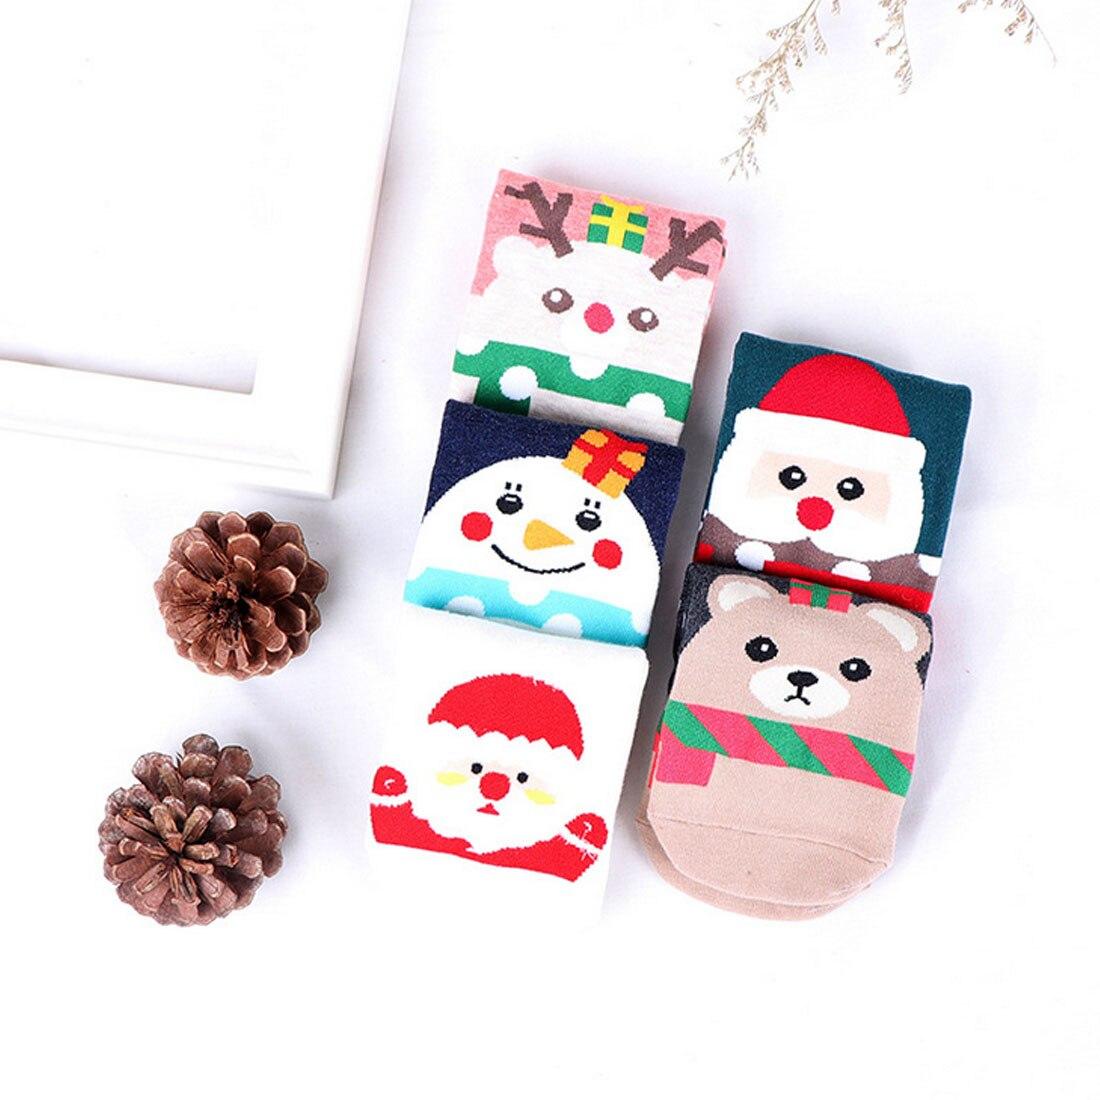 Hot Cute boat socks summer autumn and winter new low-cut socks Santa socks women breathable sweat-absorbent cotton socks